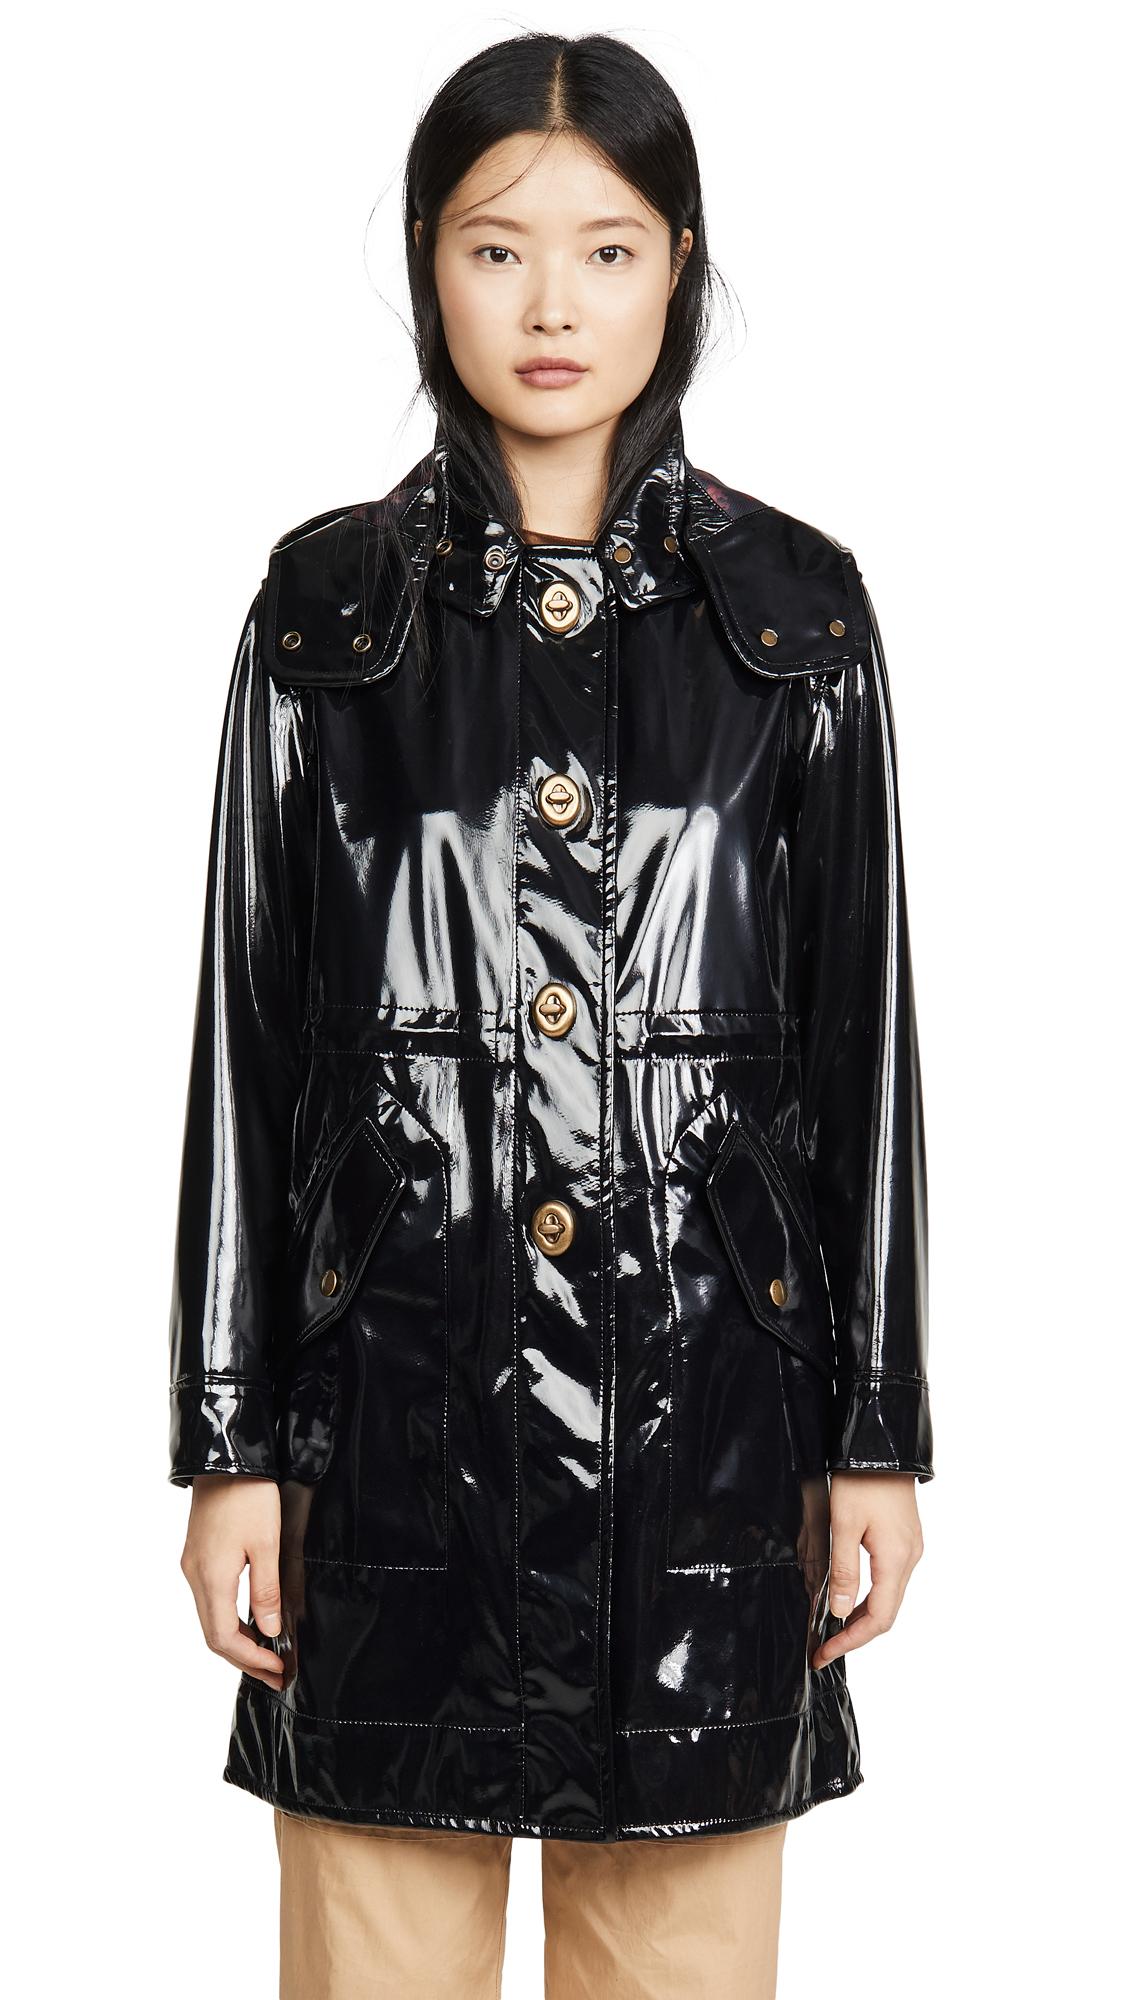 Buy Coach 1941 Horse and Carriage Raincoat online beautiful Coach Jackets, Coats, Coats